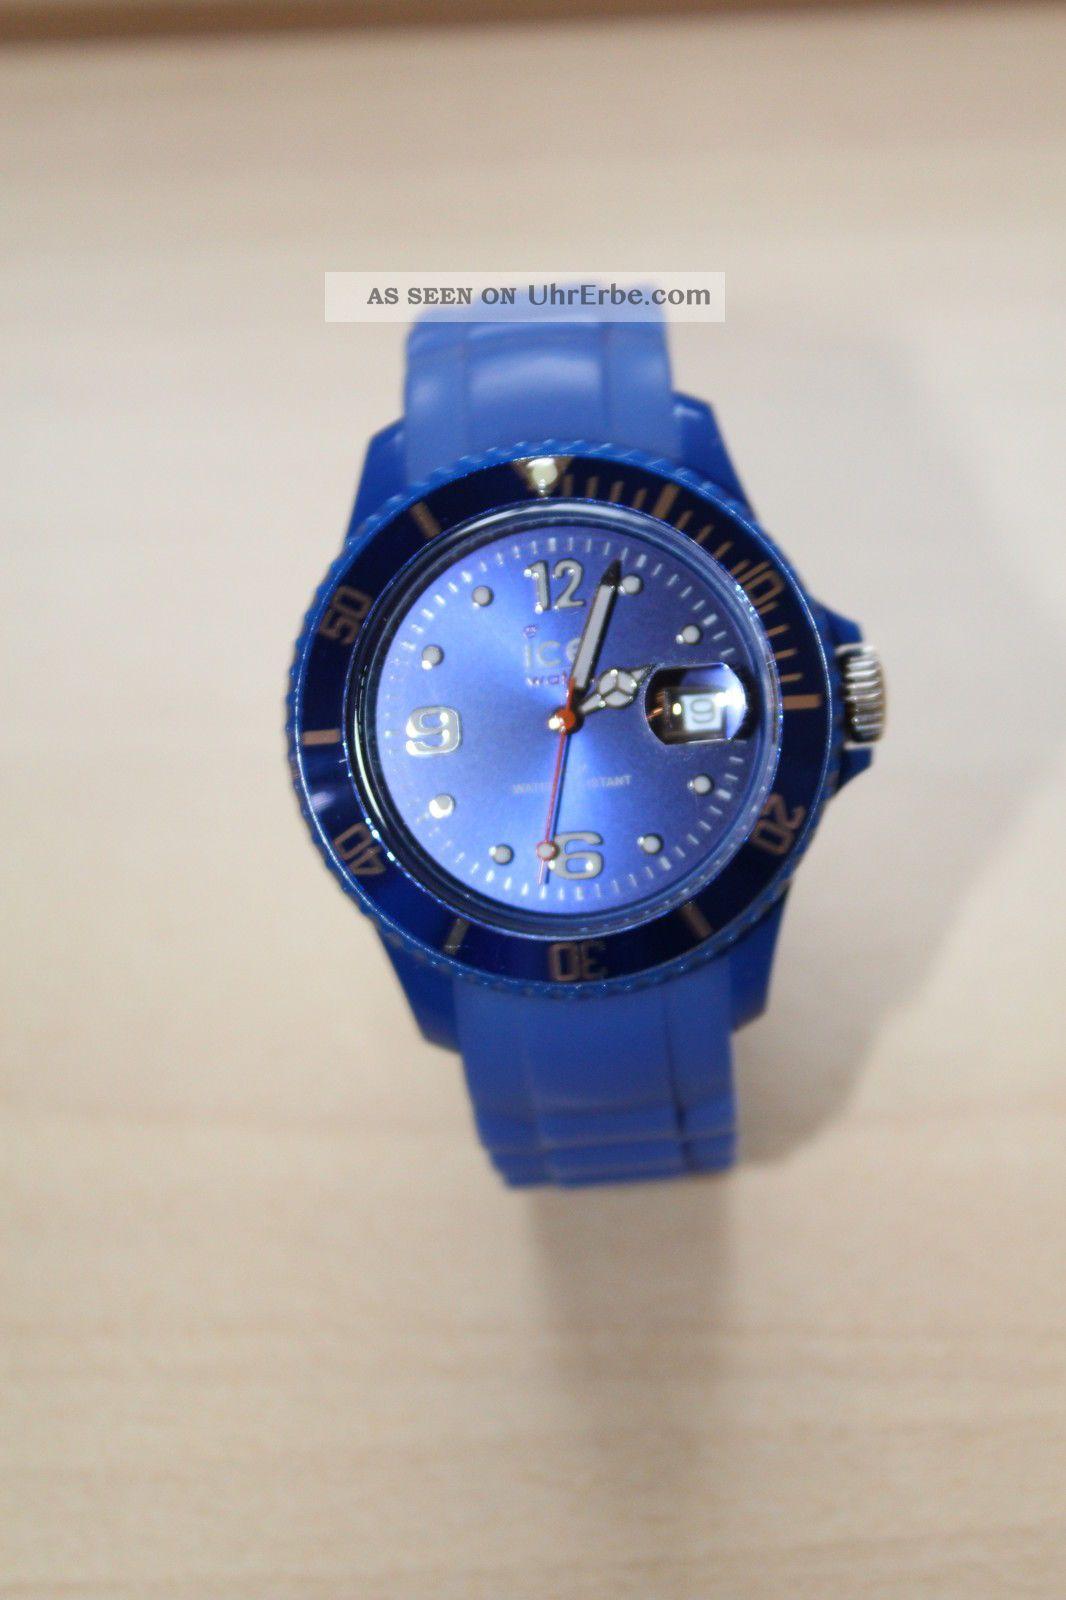 Ice Watch Uhr In Blau - Unisex Armbanduhren Bild